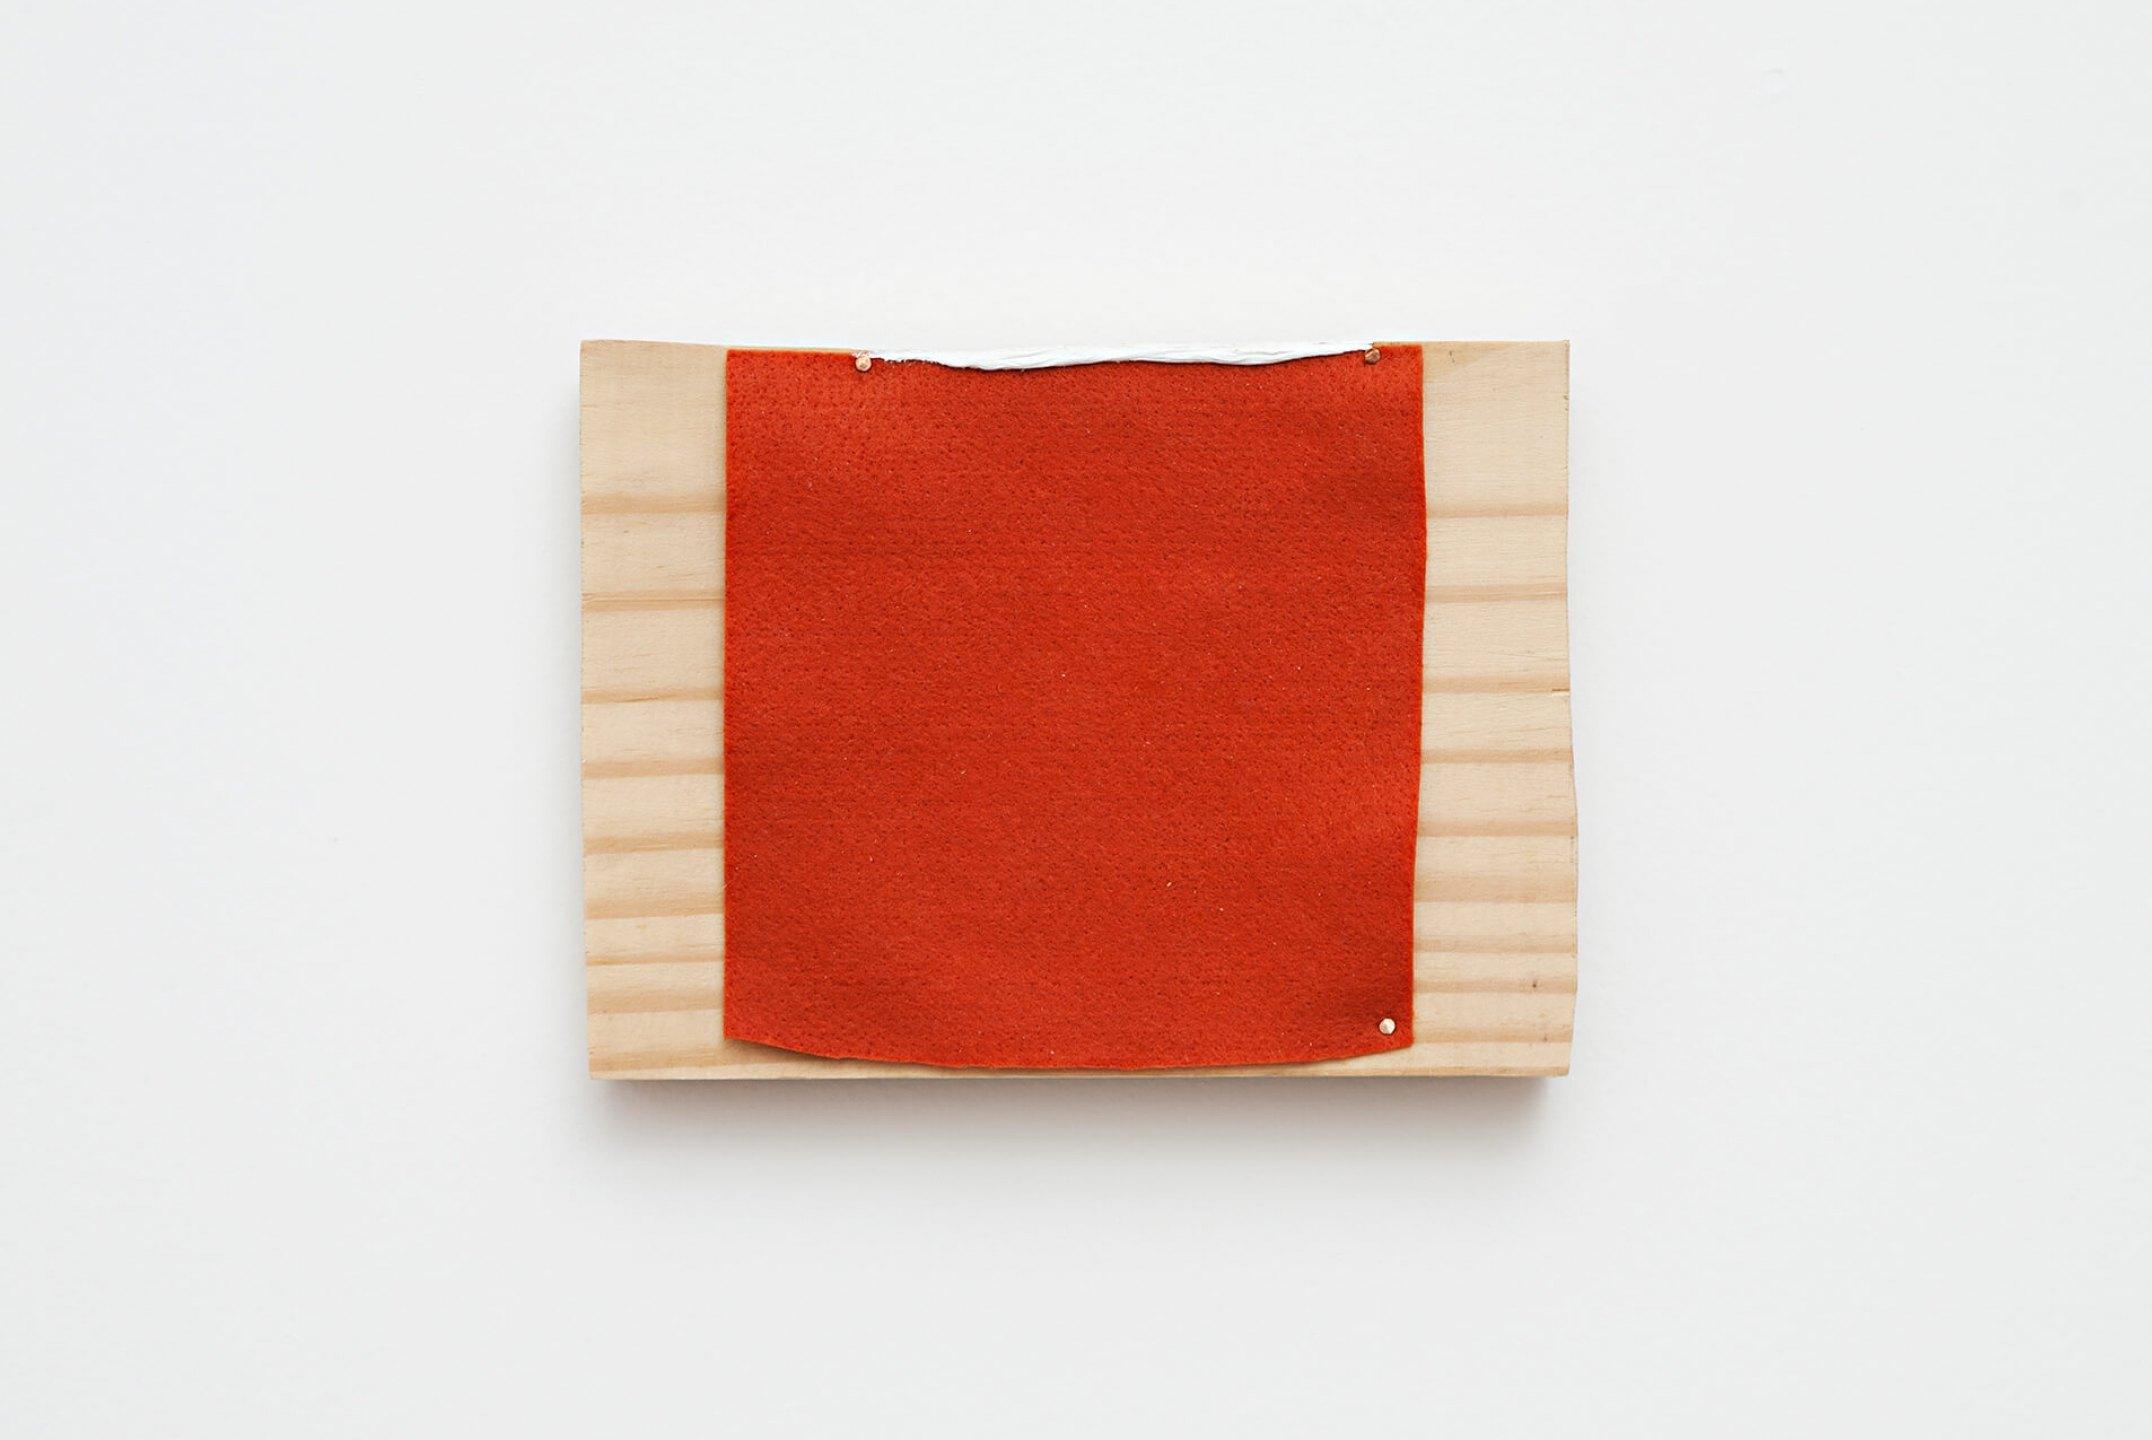 Paulo Monteiro,&nbsp;<em>untitled,</em> 2013, oil, felt, copper nail on wood, 18,5 × 14 cm - Mendes Wood DM